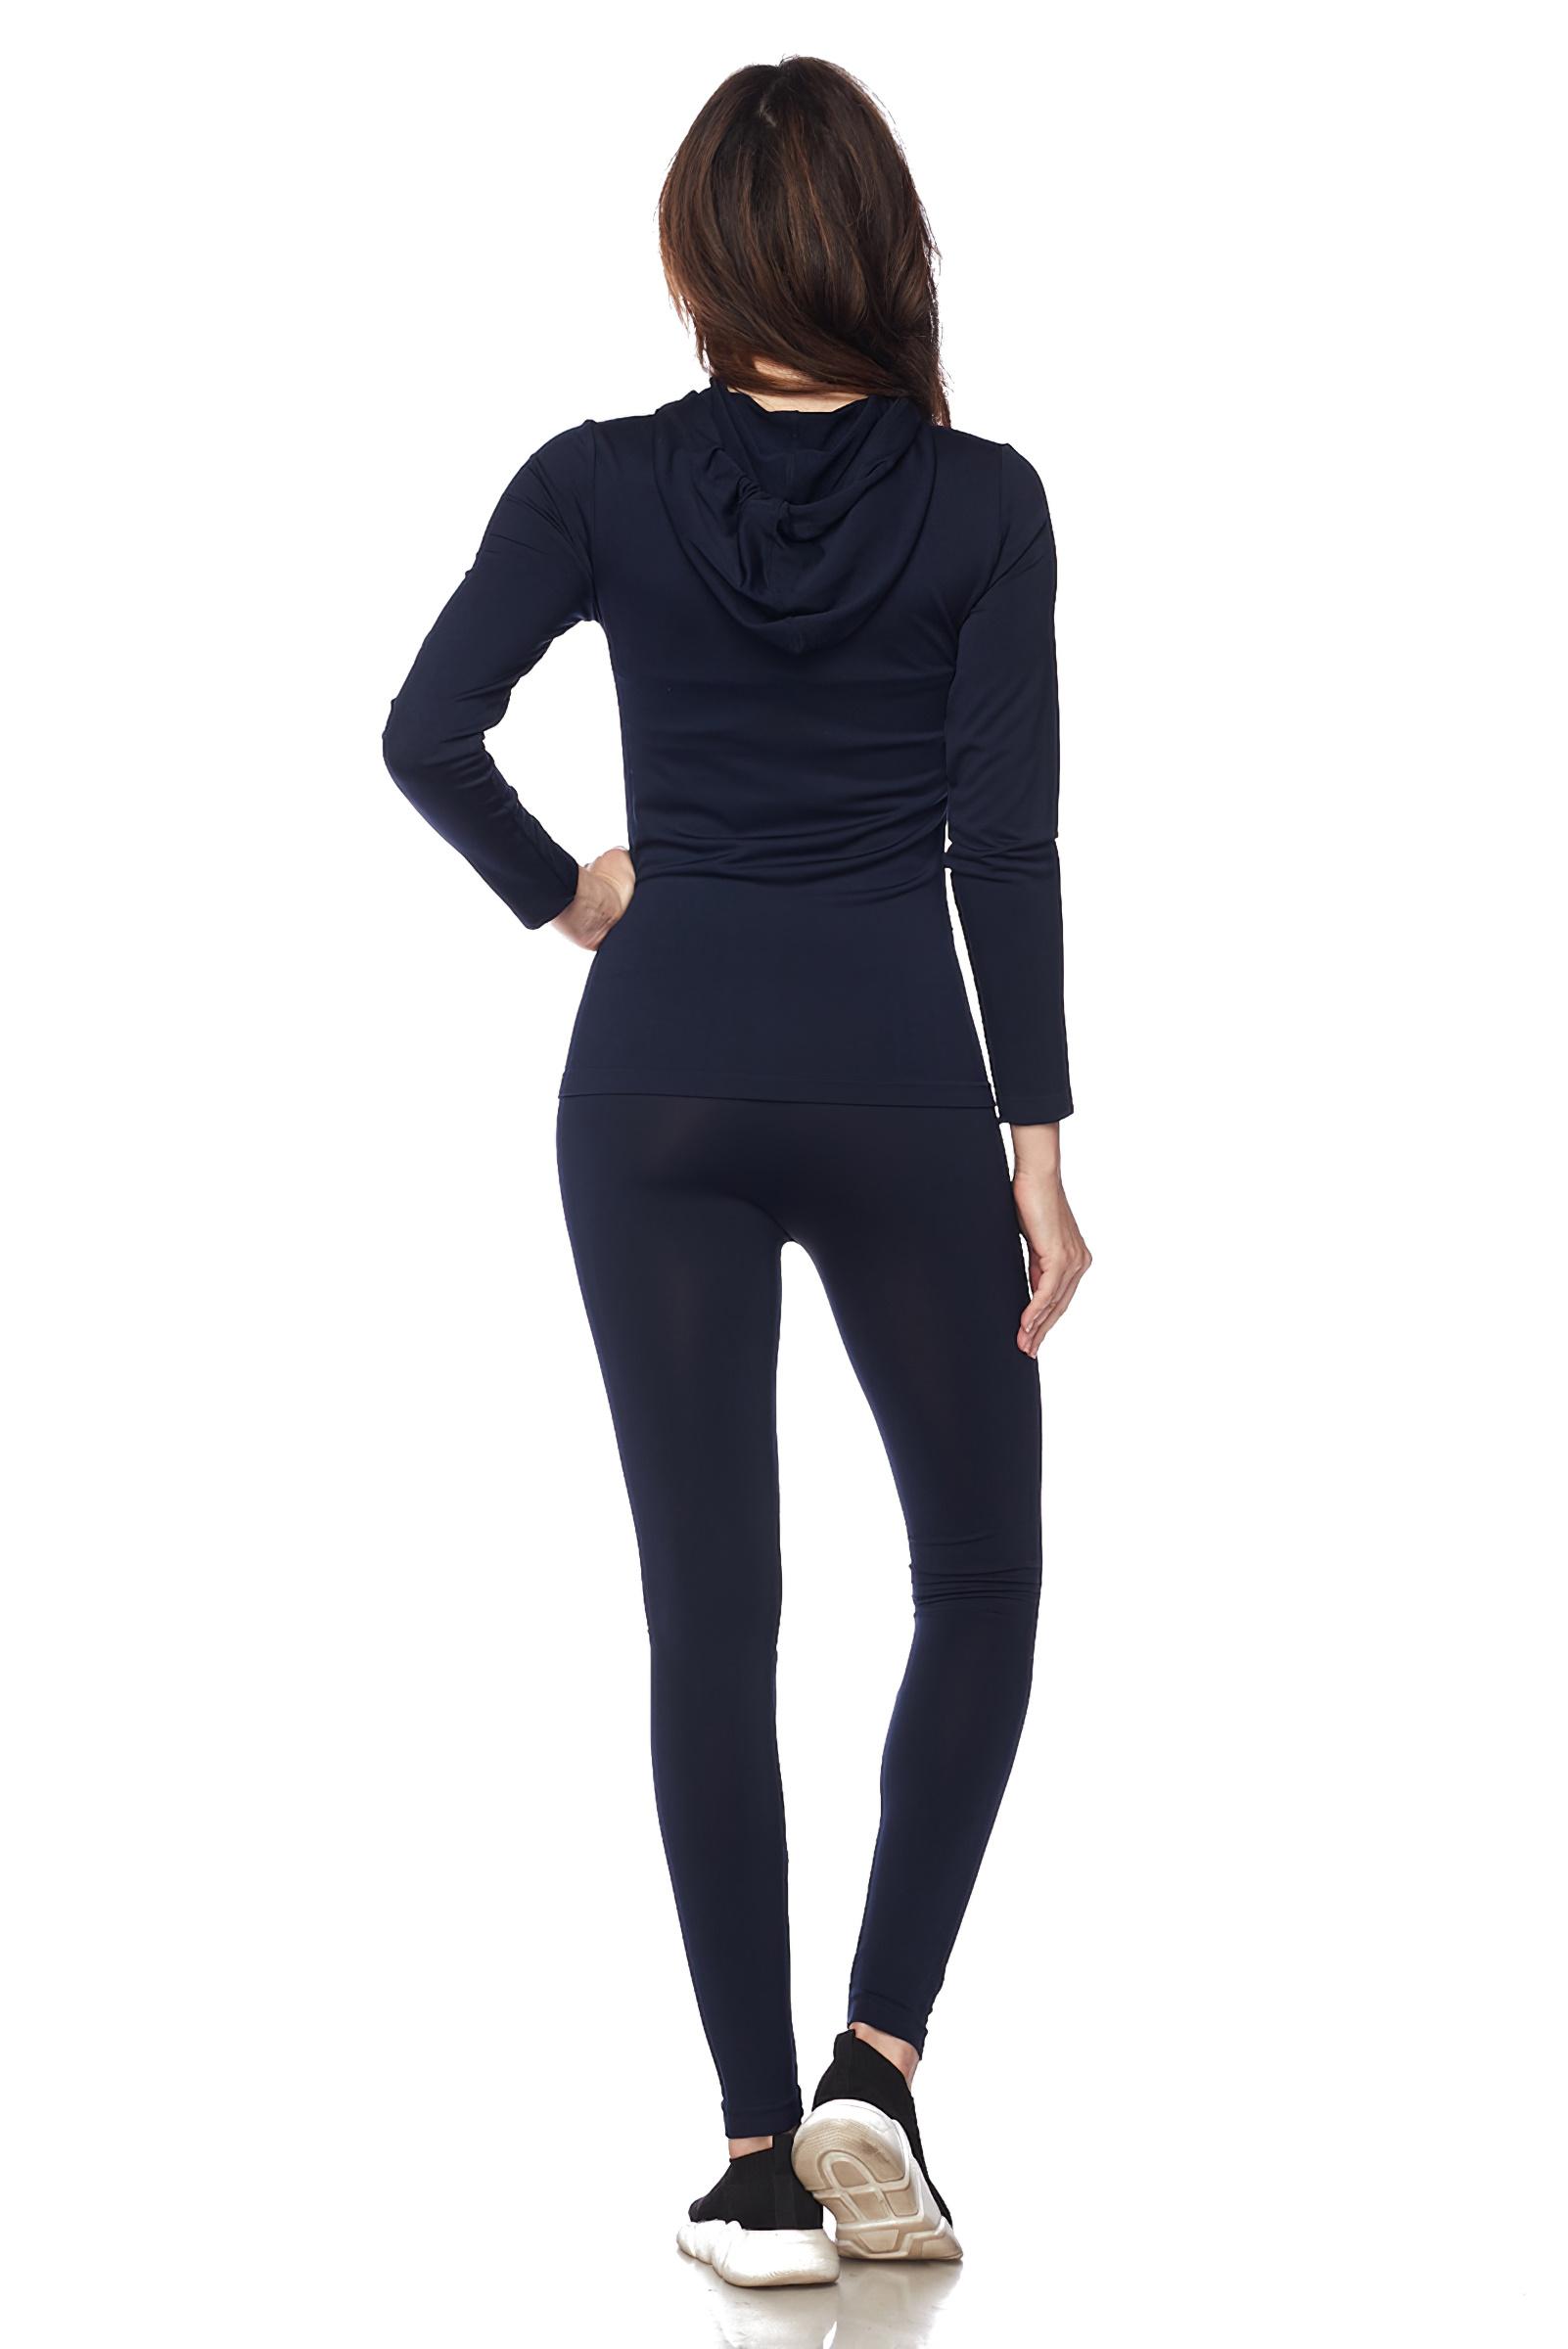 Women-039-s-Juniors-Active-Set-Wear-Zip-Up-Hoodie-and-Legging thumbnail 26